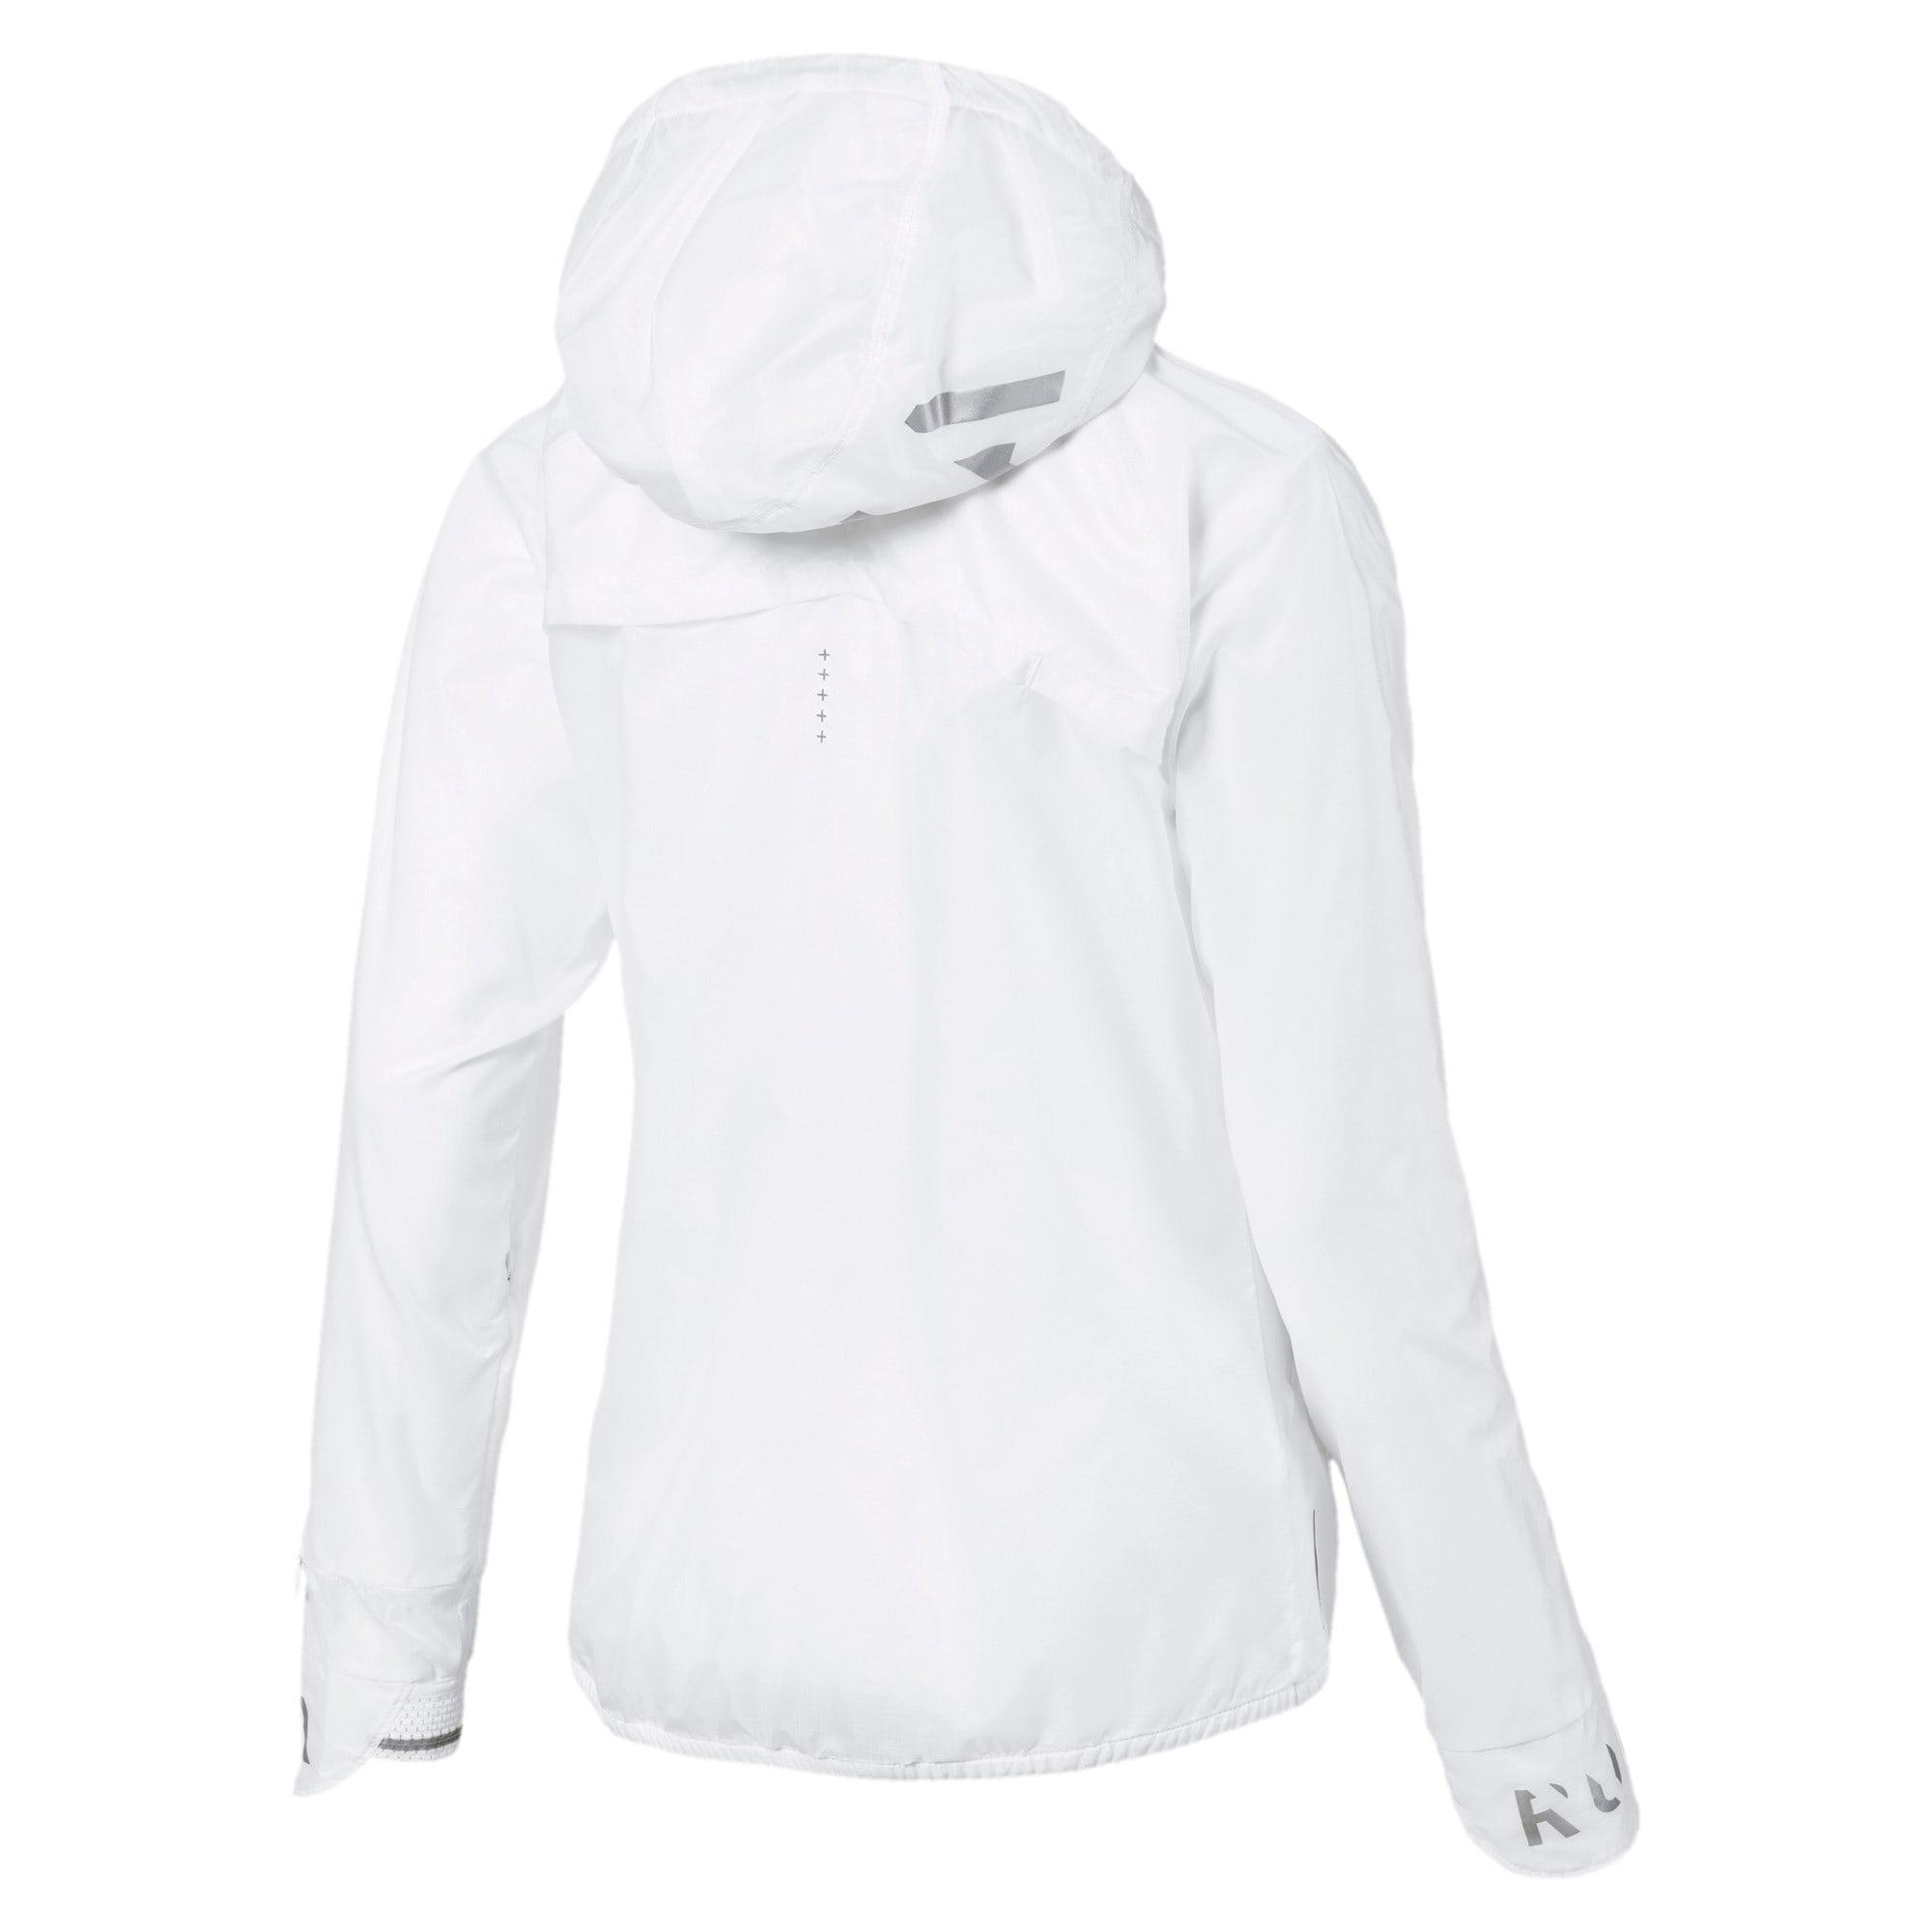 Thumbnail 5 of Get Fast Hooded Full Zip Women's Running Jacket, Puma White, medium